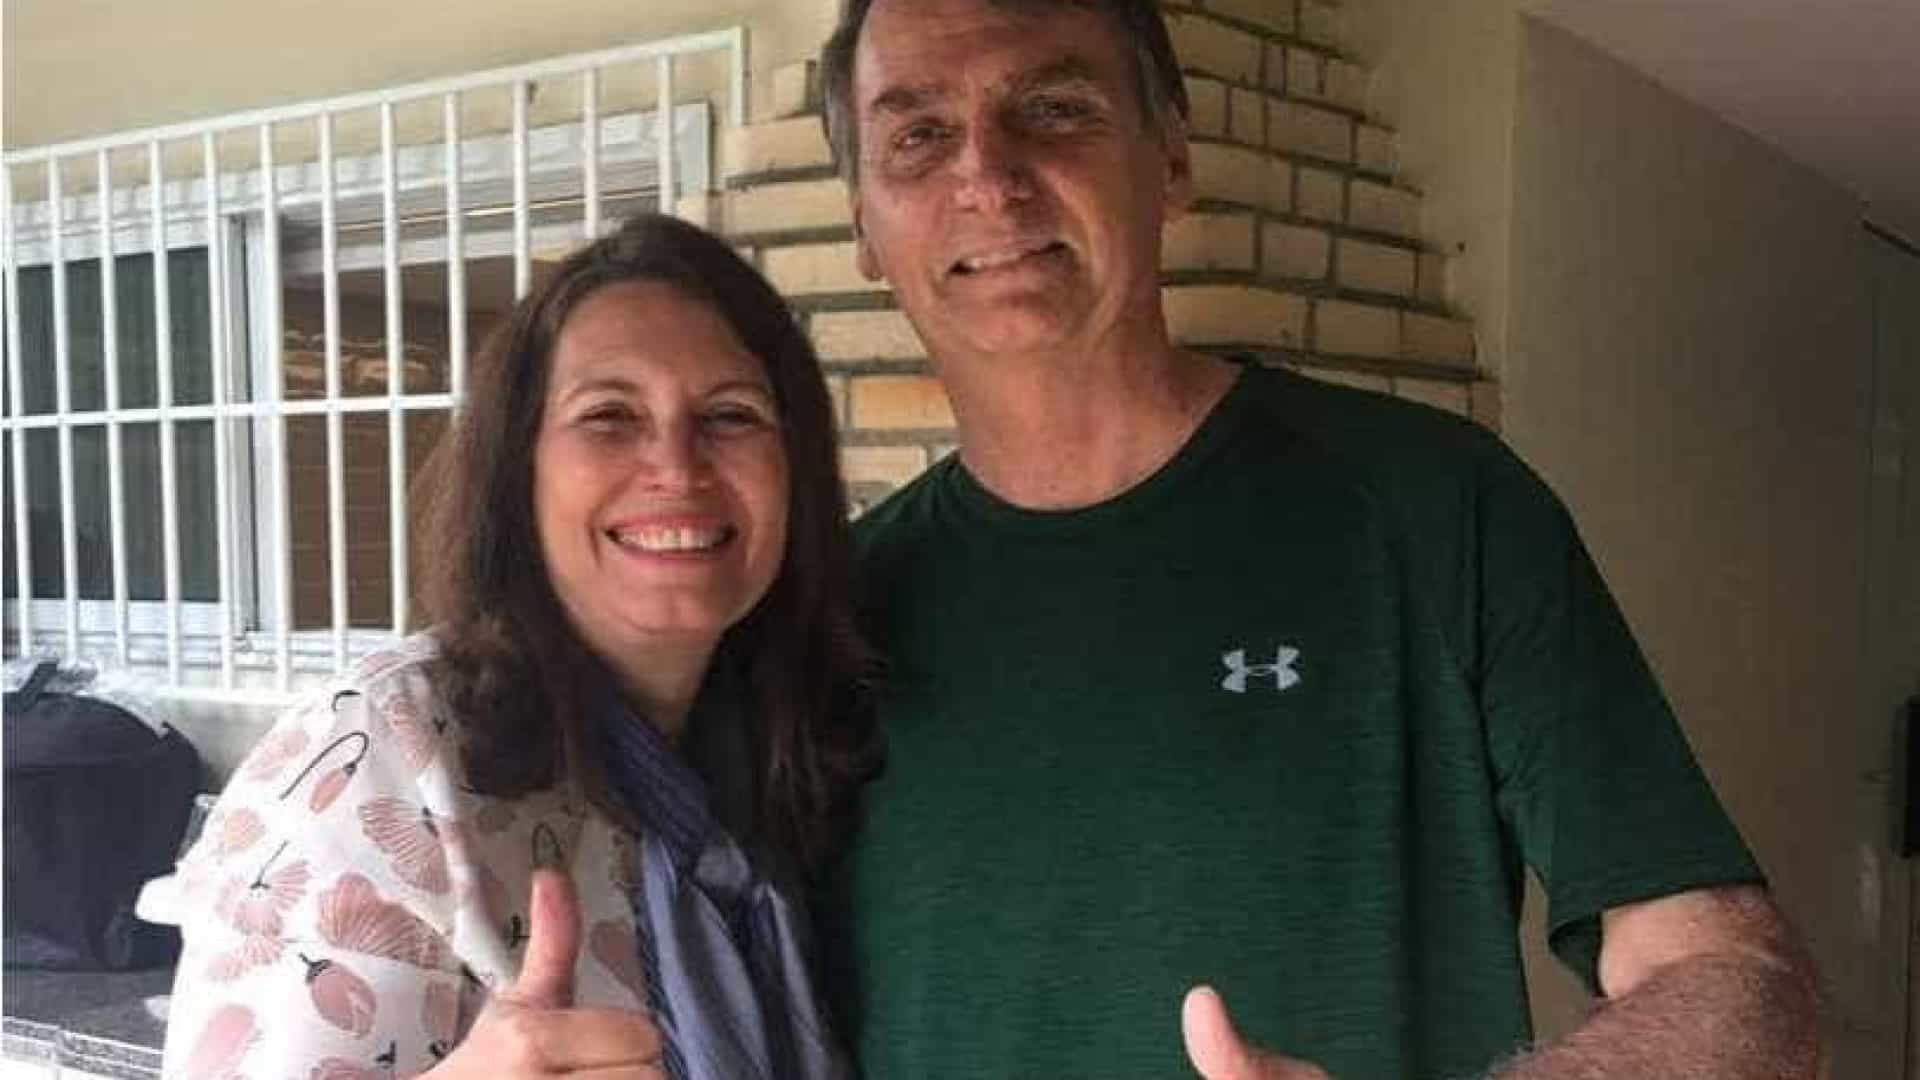 Após retirá-la da vice-liderança do governo, Bolsonaro visita deputada